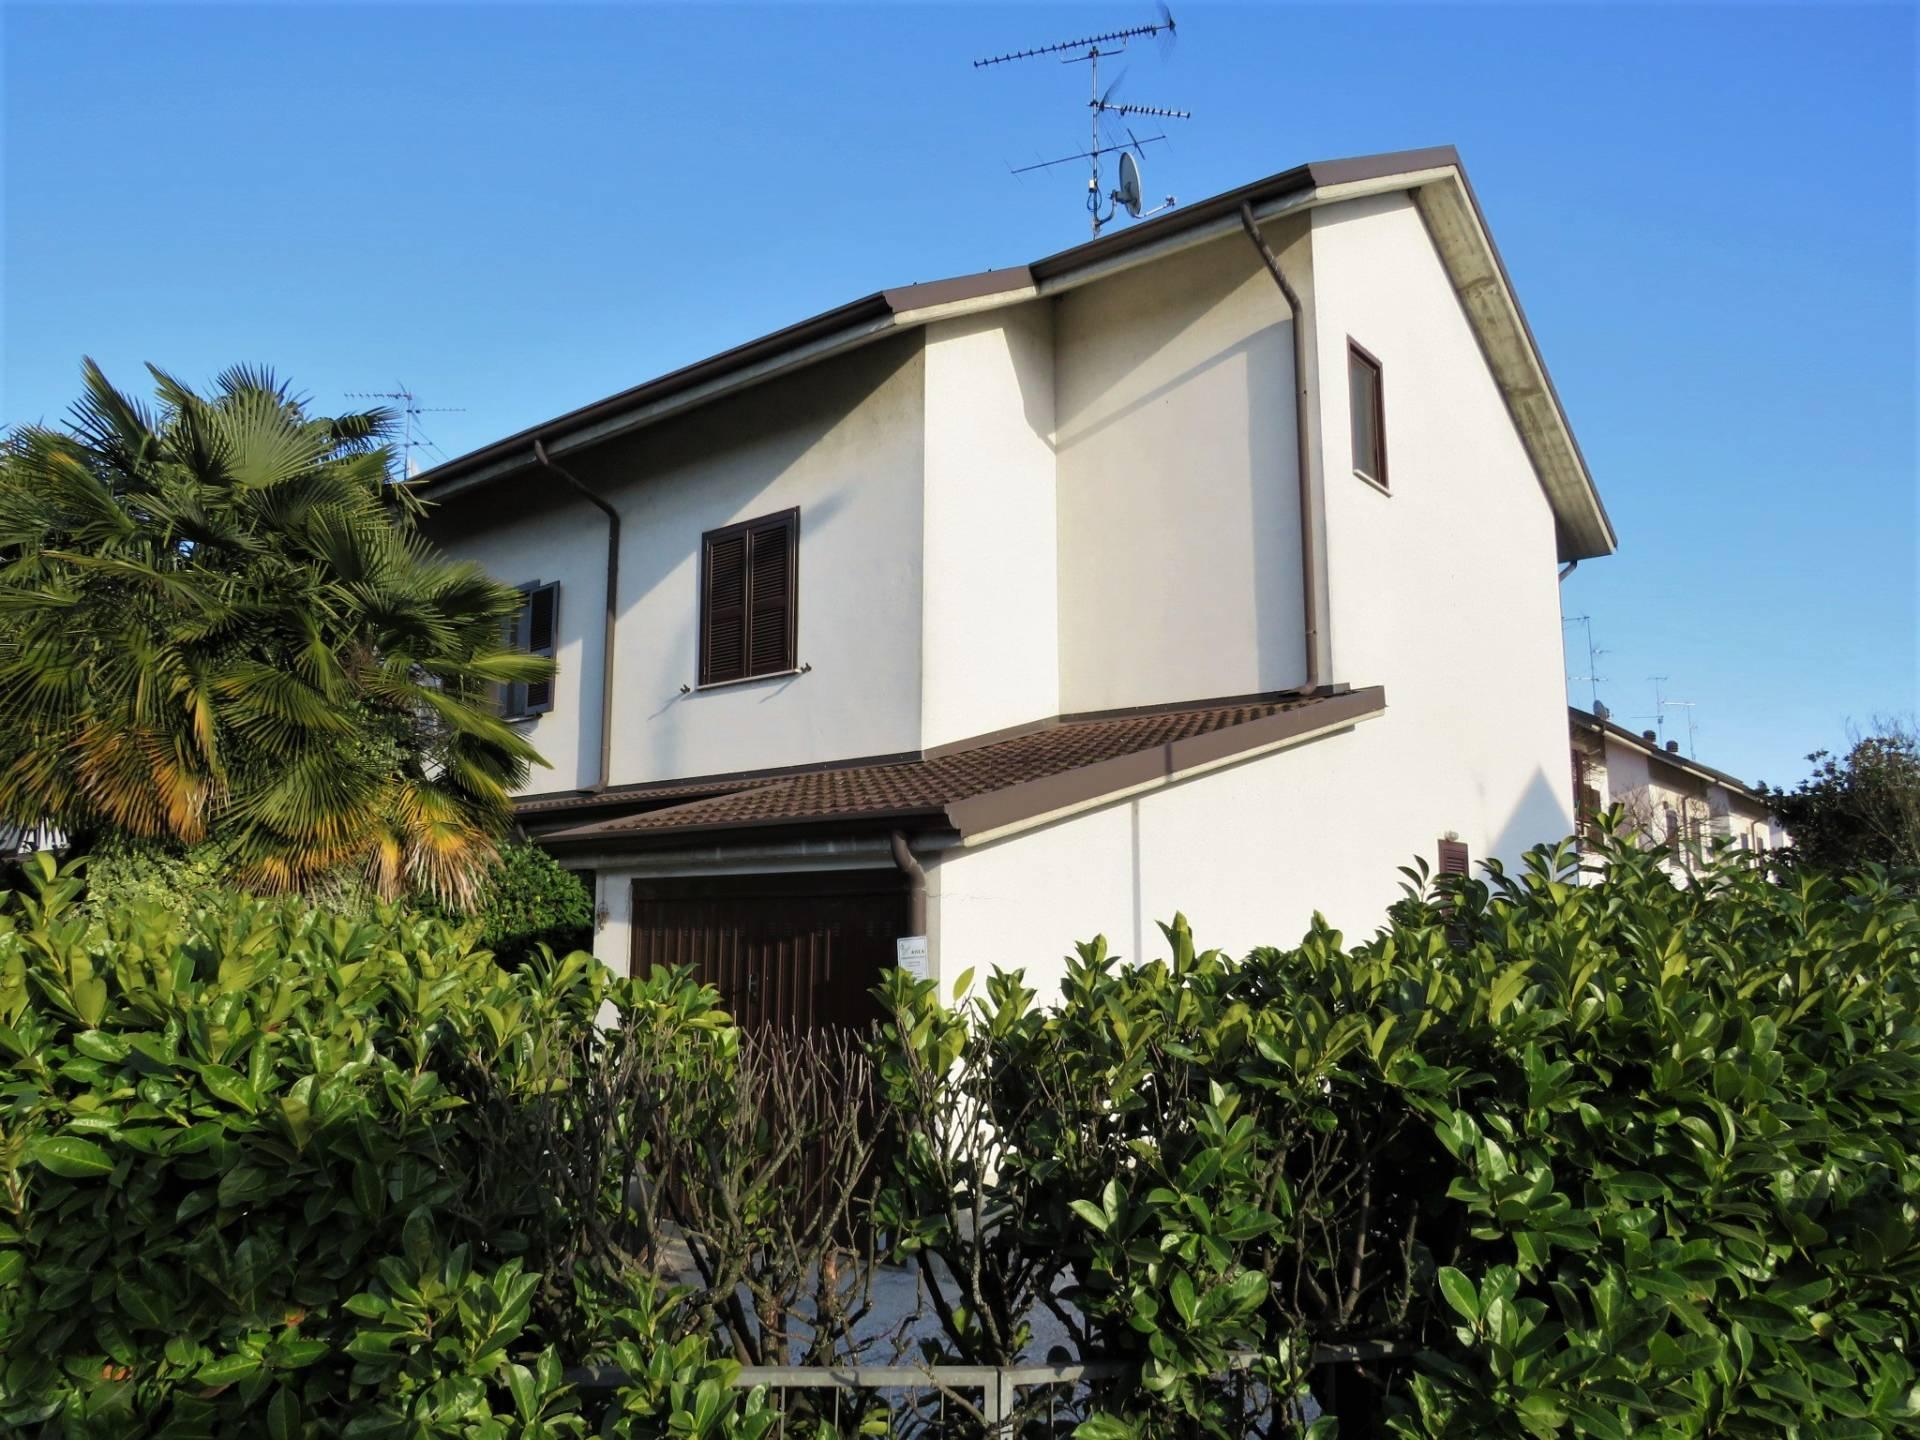 Pieve Emanuele | Villetta a Schiera in Vendita in Via Santi | lacasadimilano.it